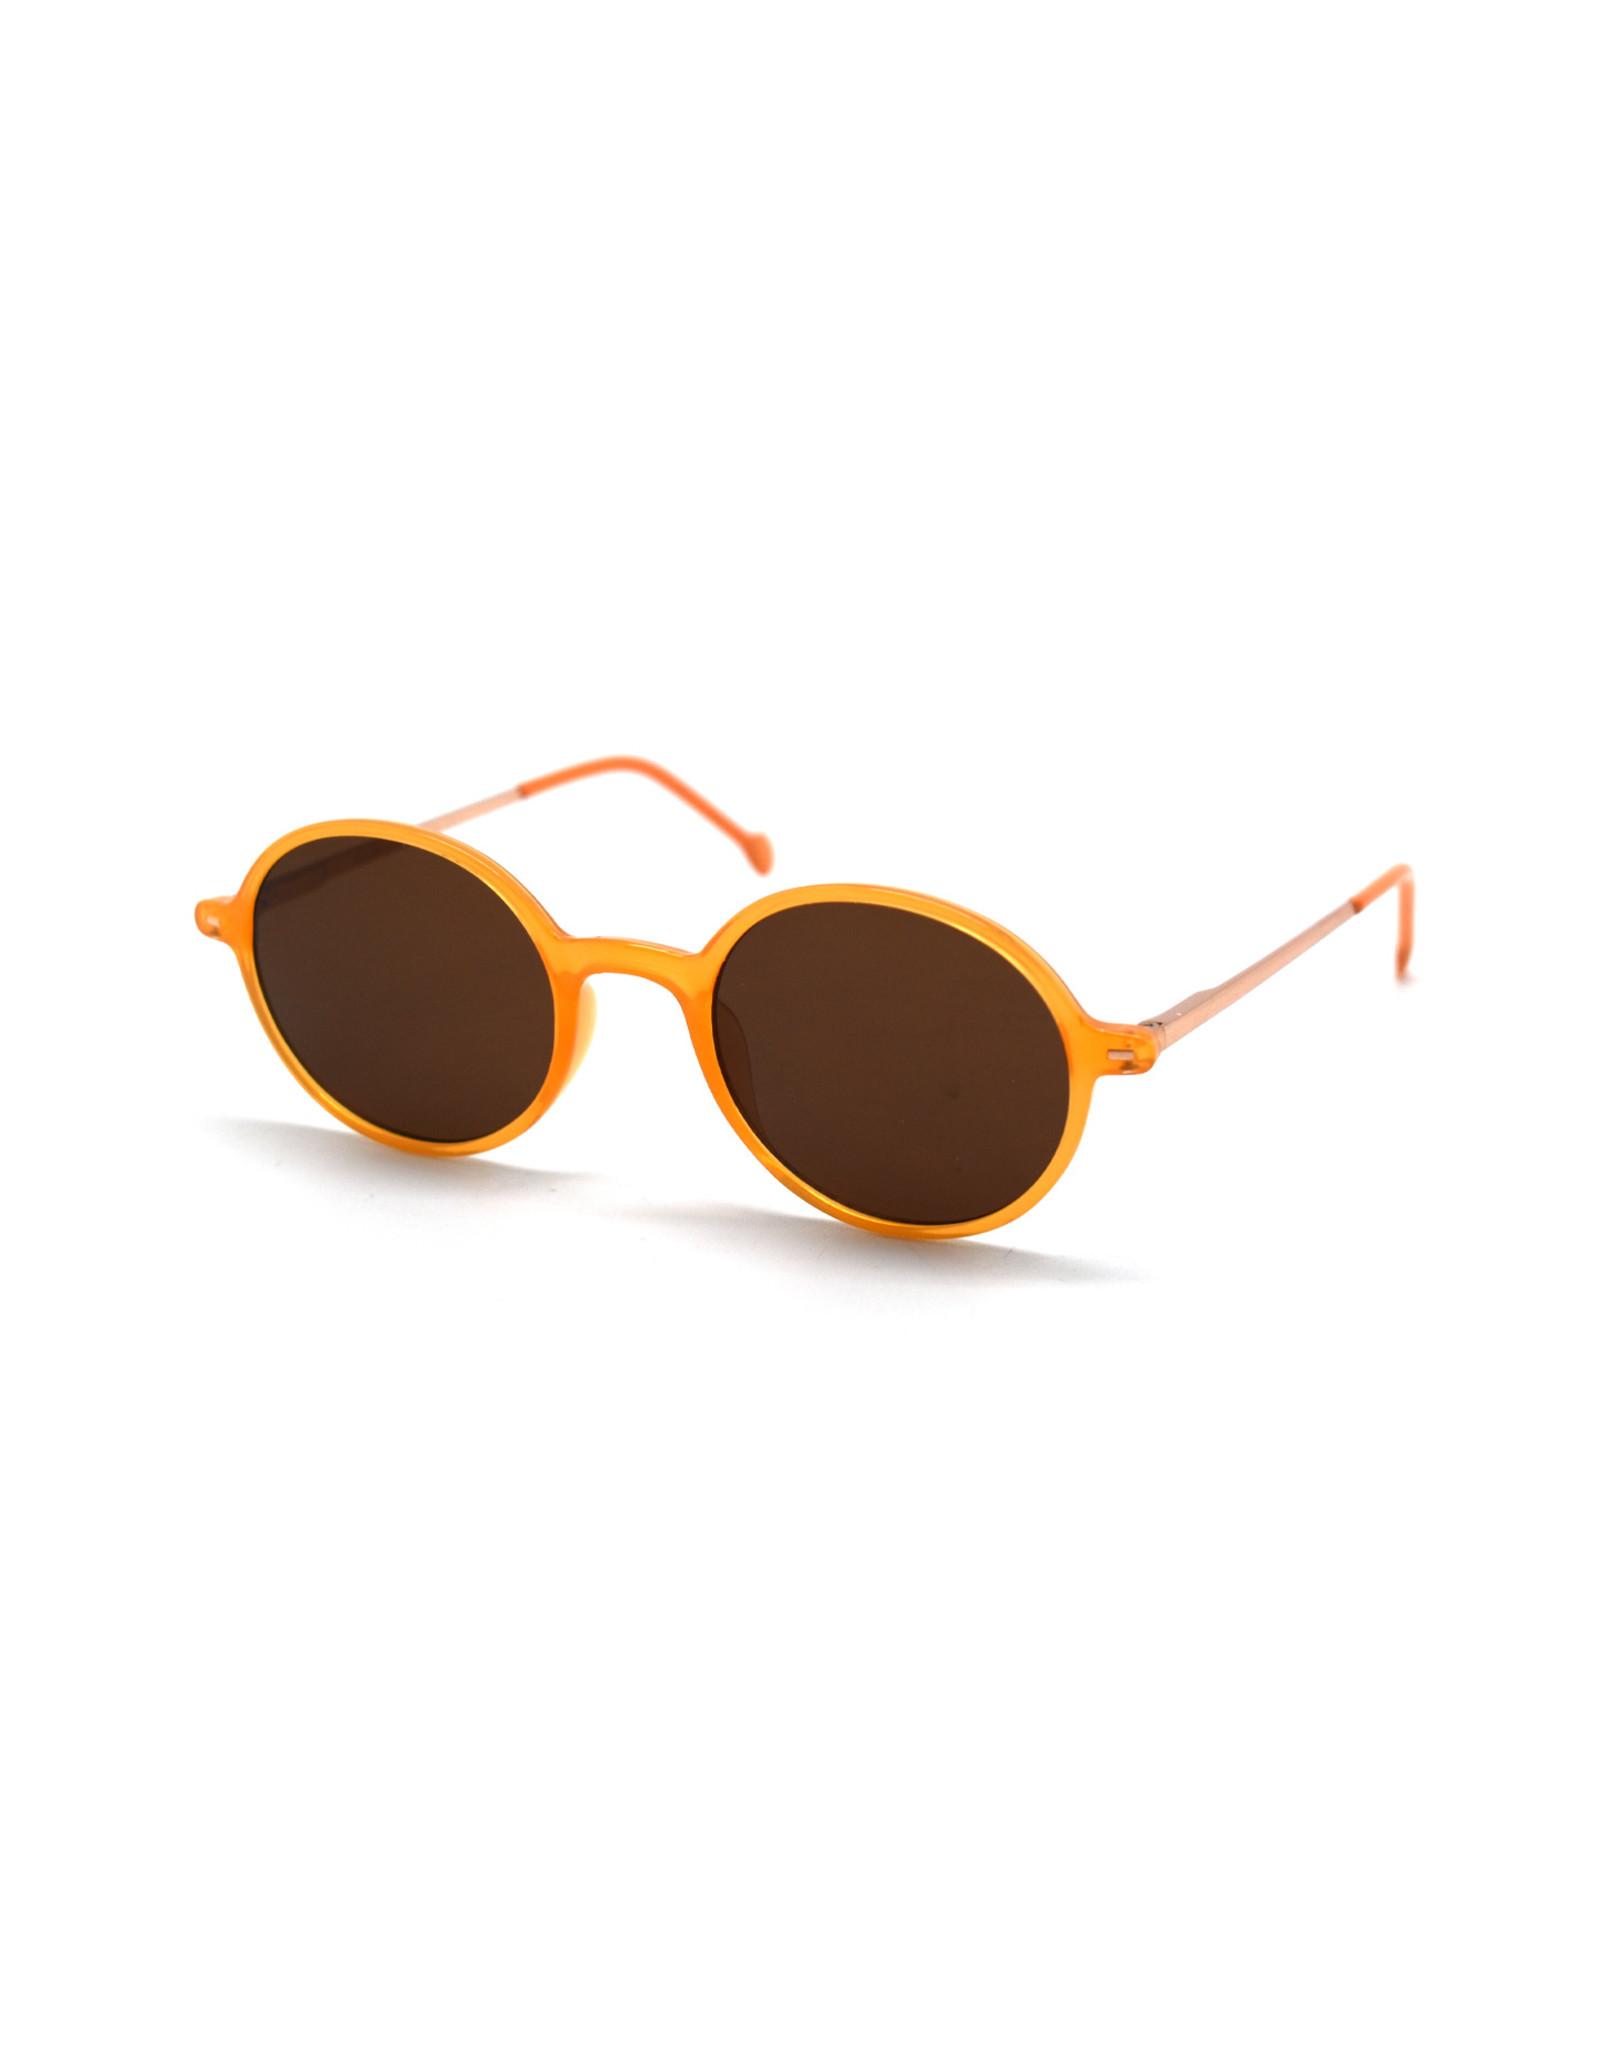 Lava Lamp Sunglasses